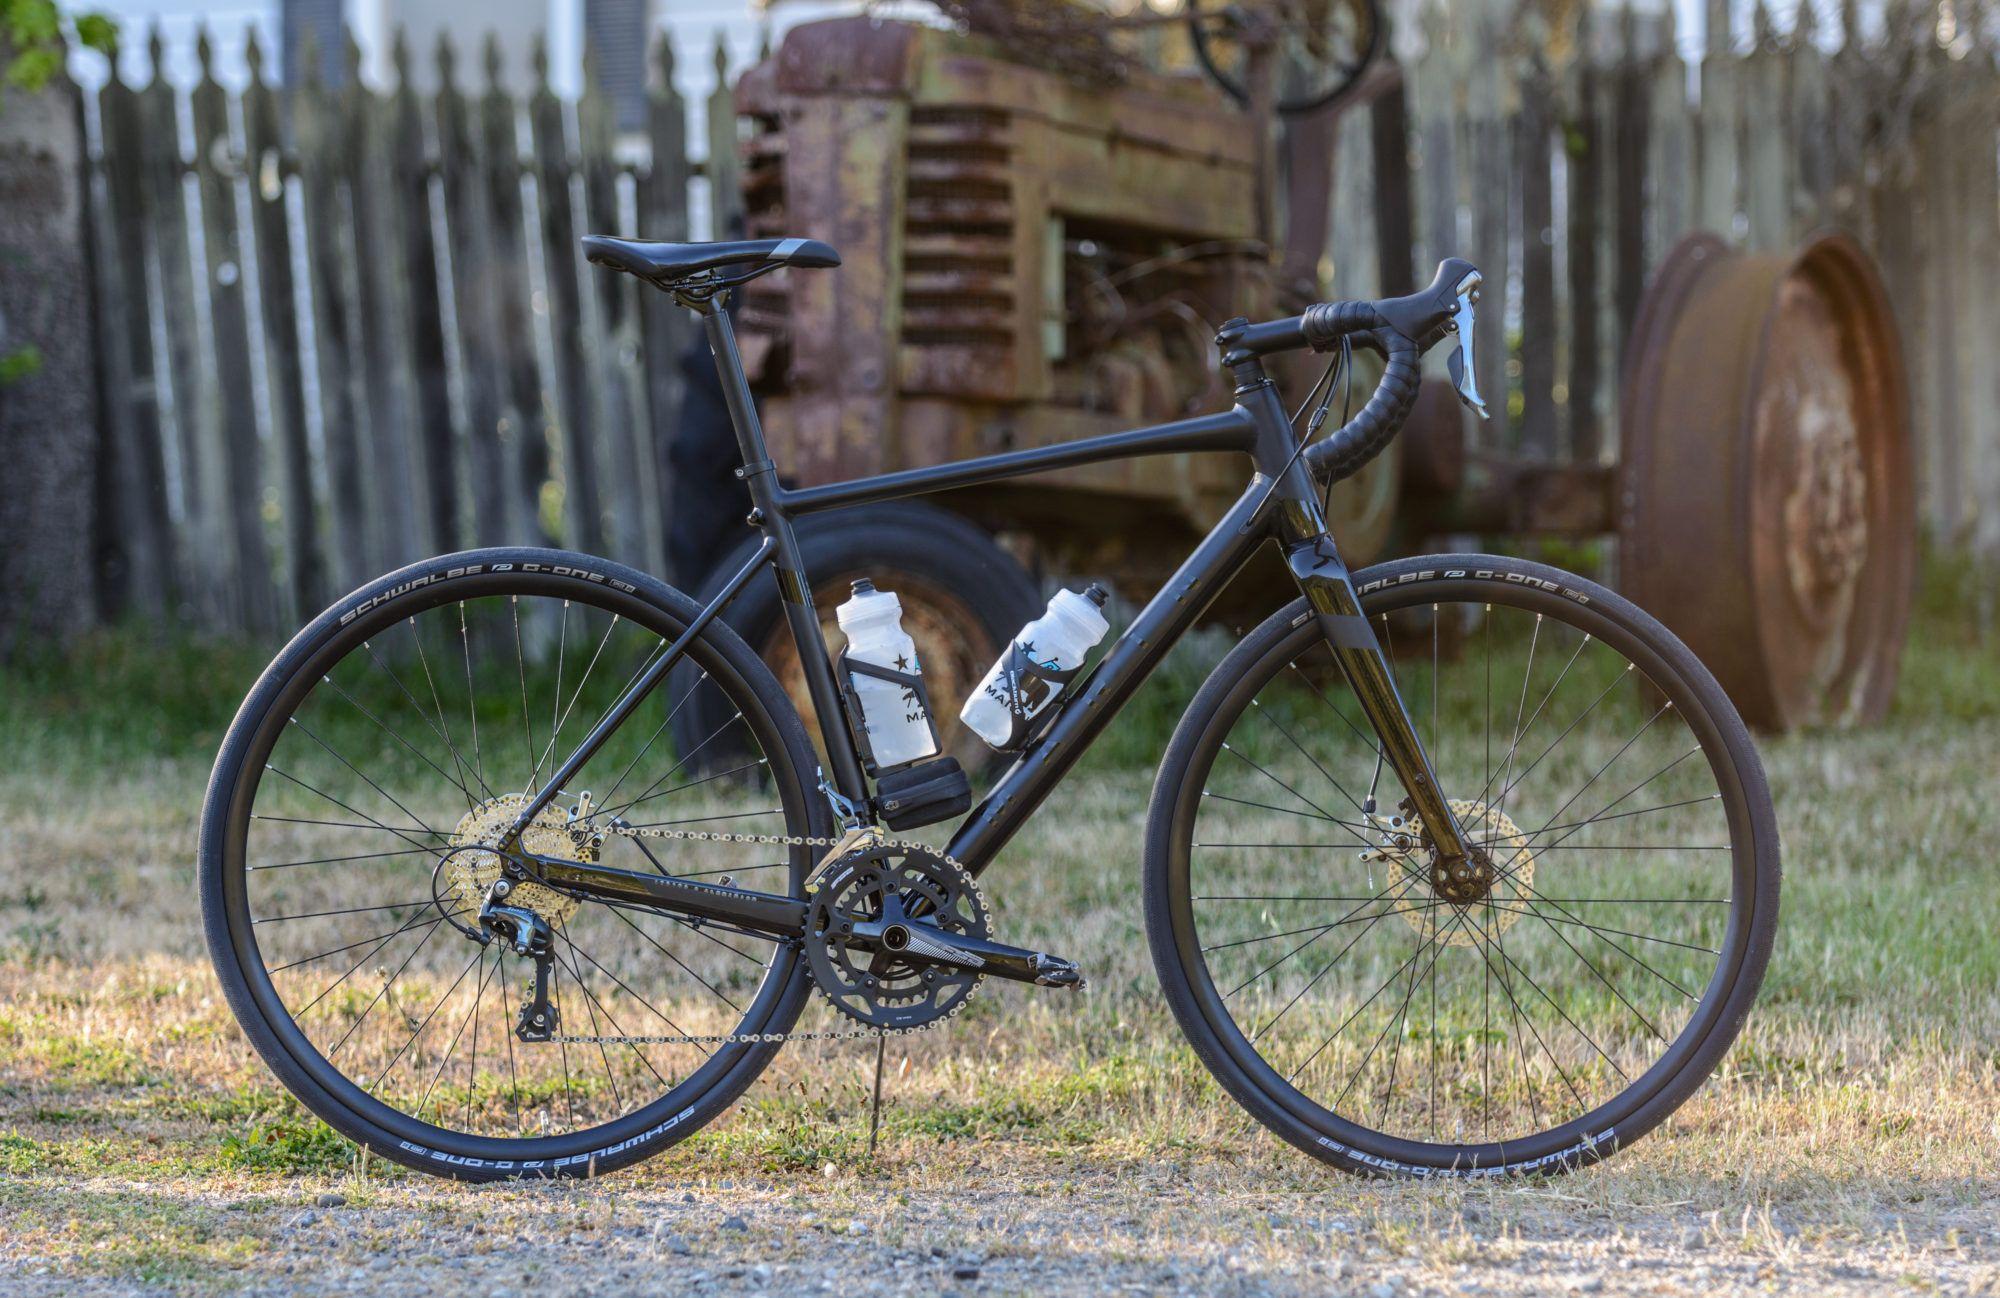 2019 Gestalt 2 Marin Bikes Bike Commuter Bike Marines